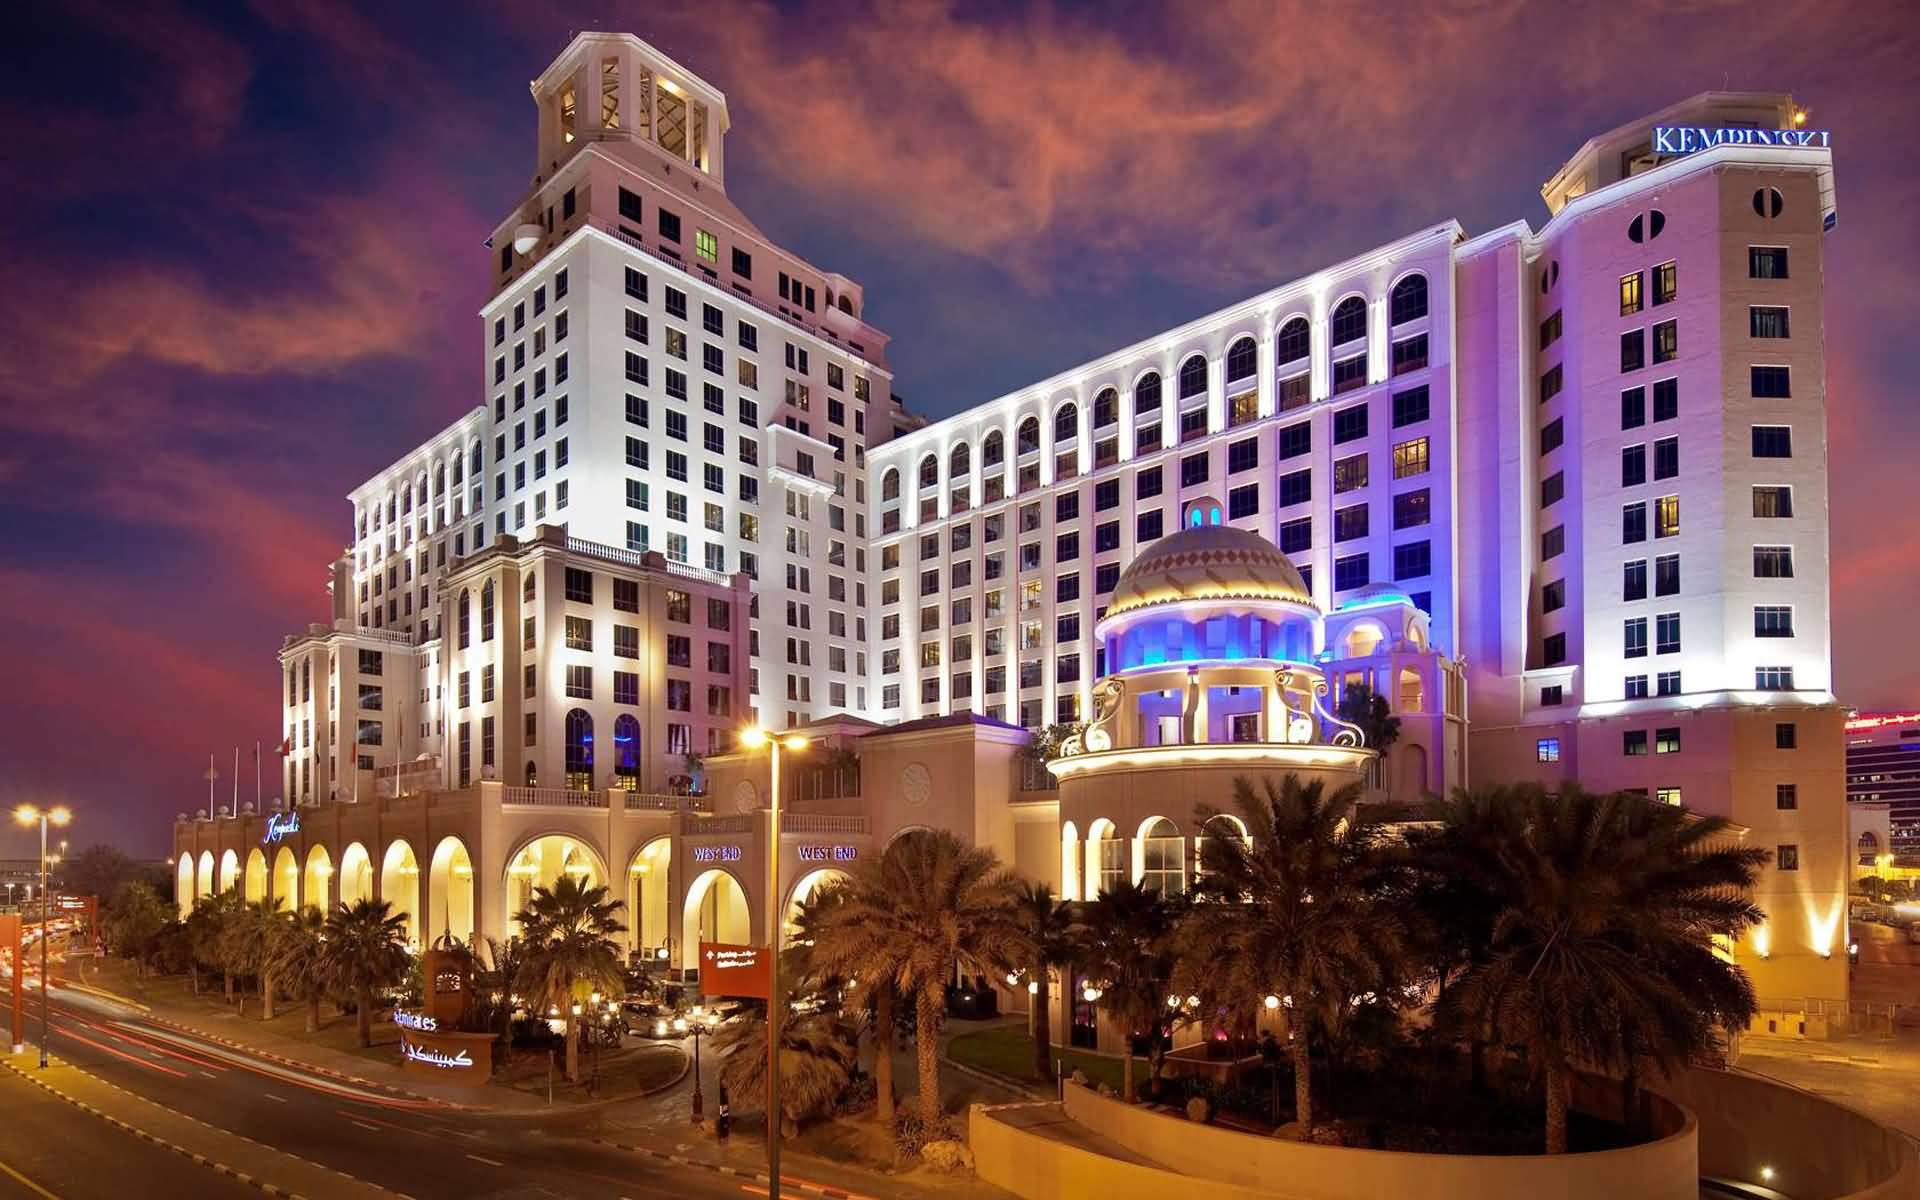 Mall-Of-Emirates-Kempinski-Hotel-Mall-Of-The-Emirates-Sheikh-Zayed-Rd-Dubai-Uae